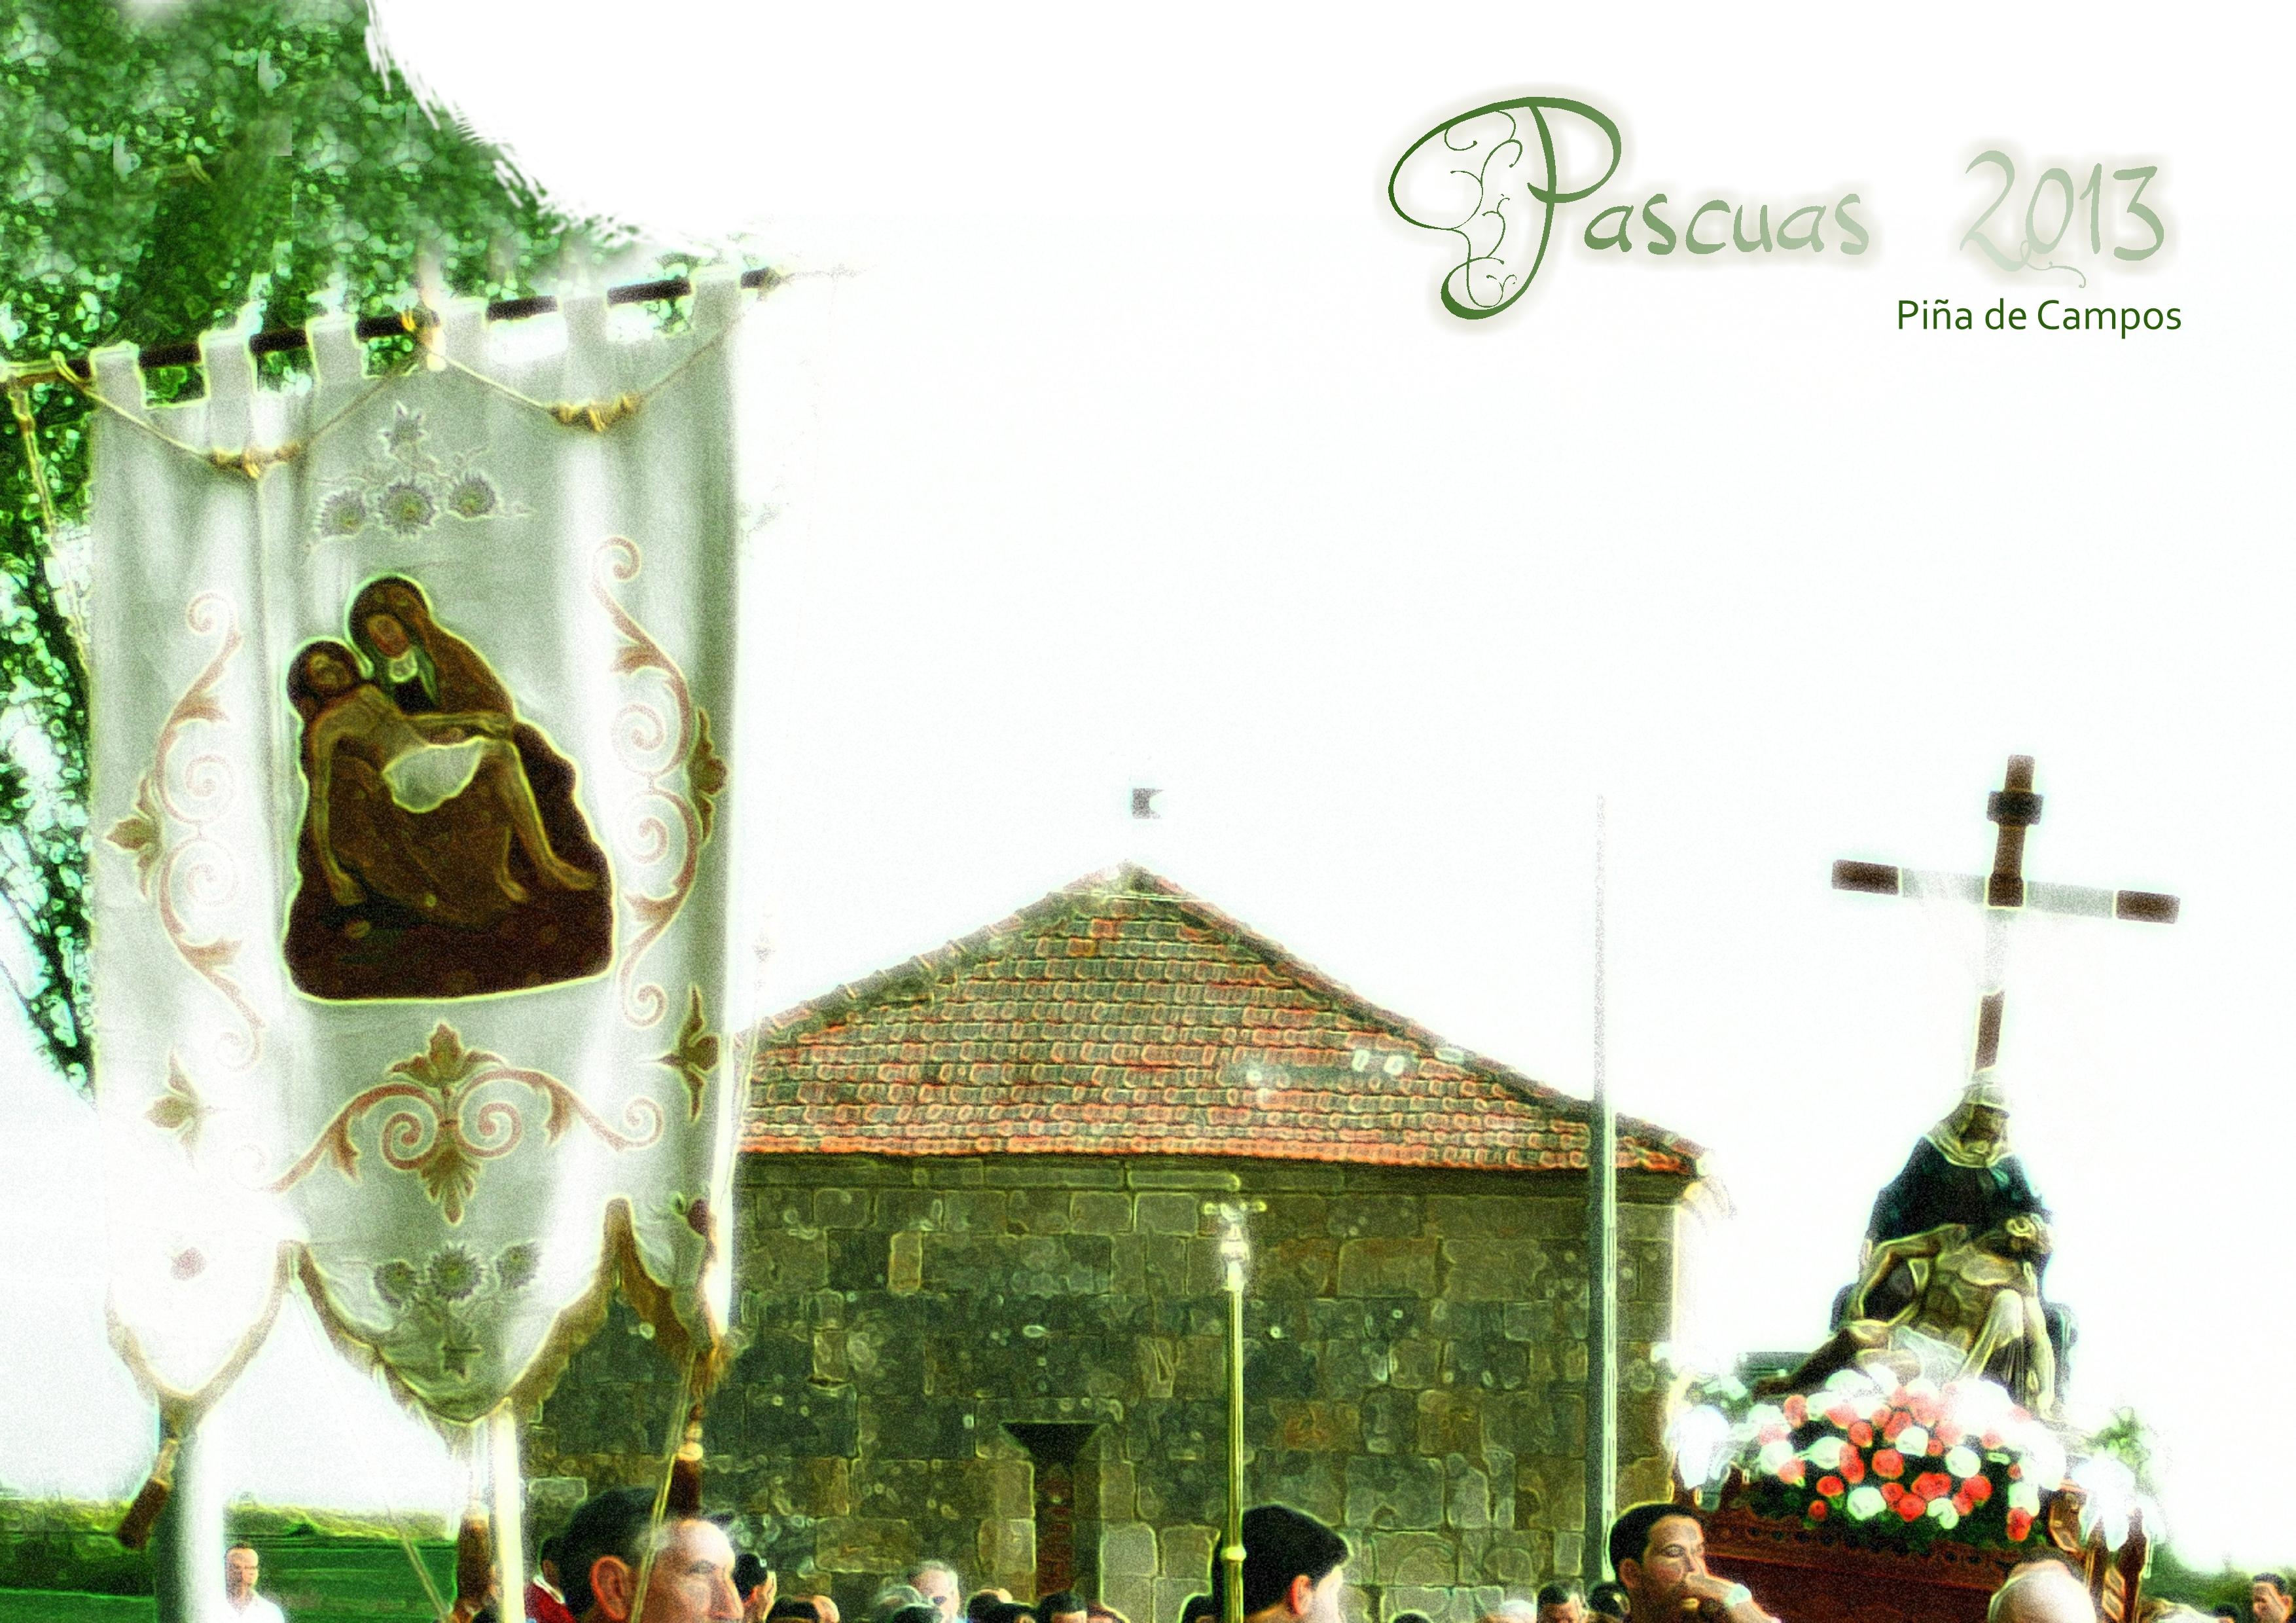 Programa de Fiestas Pascuas 2013